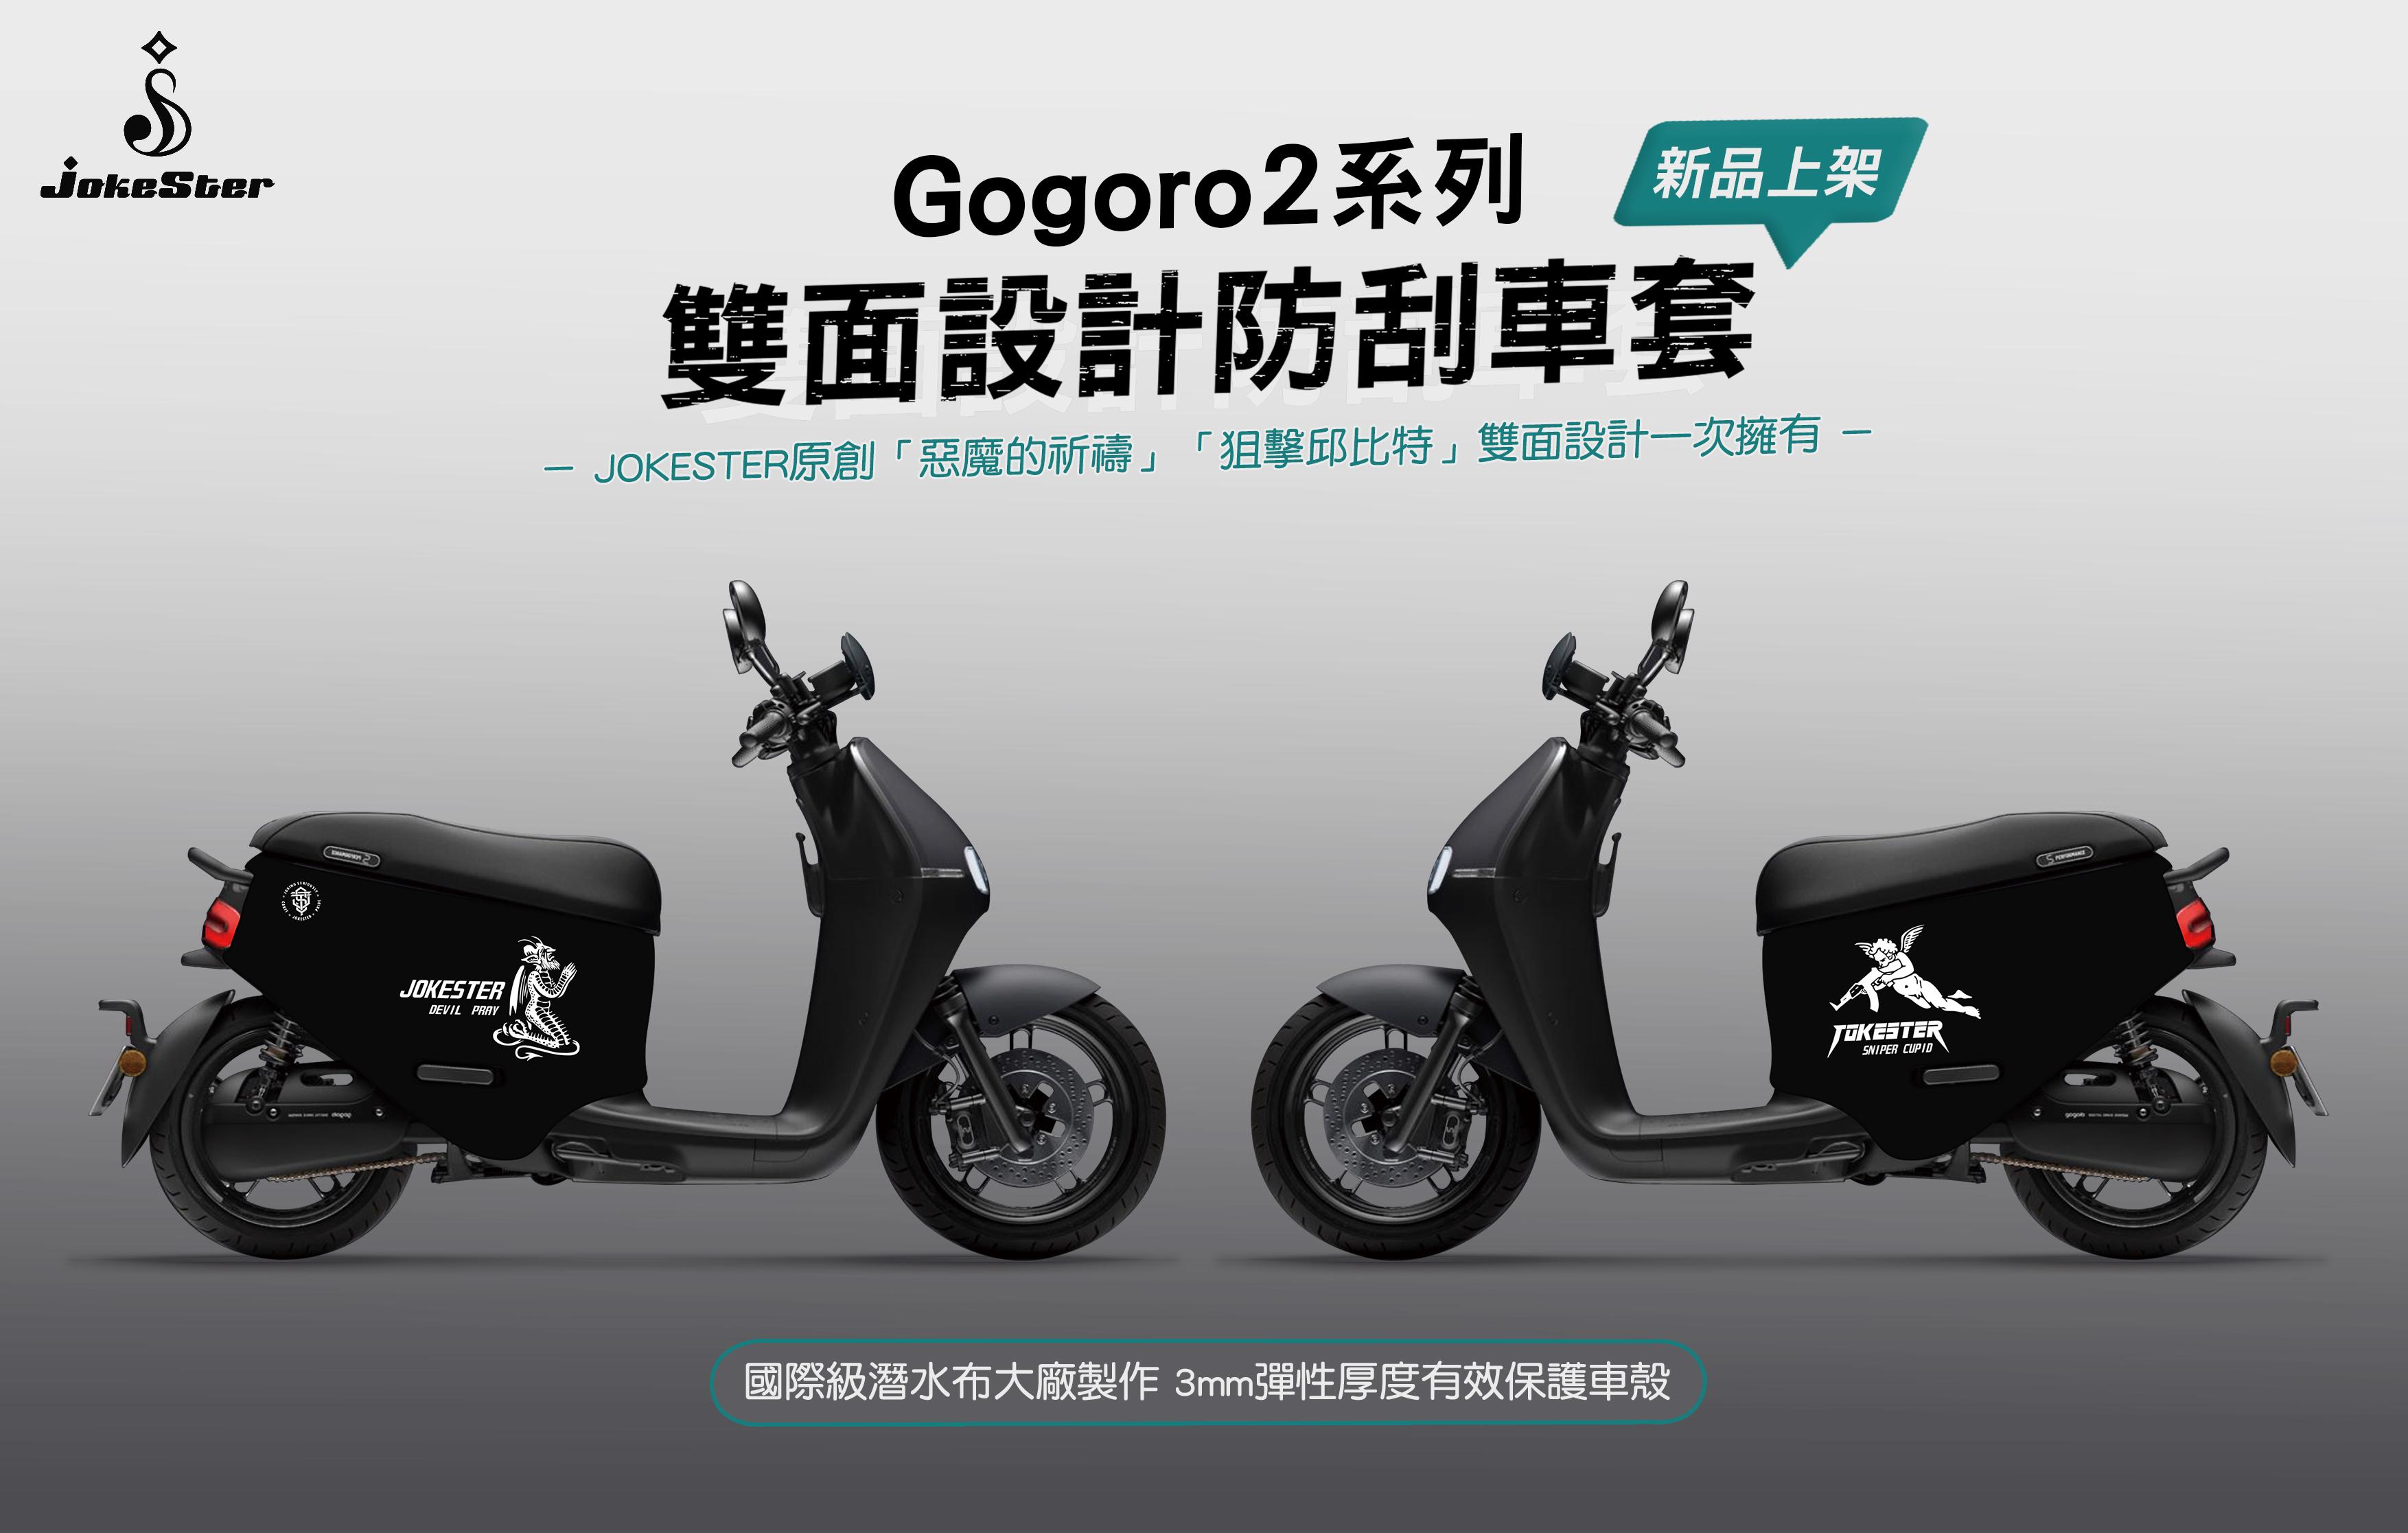 GOGORO,GOGORO2,GOGORO車套,防刮車套